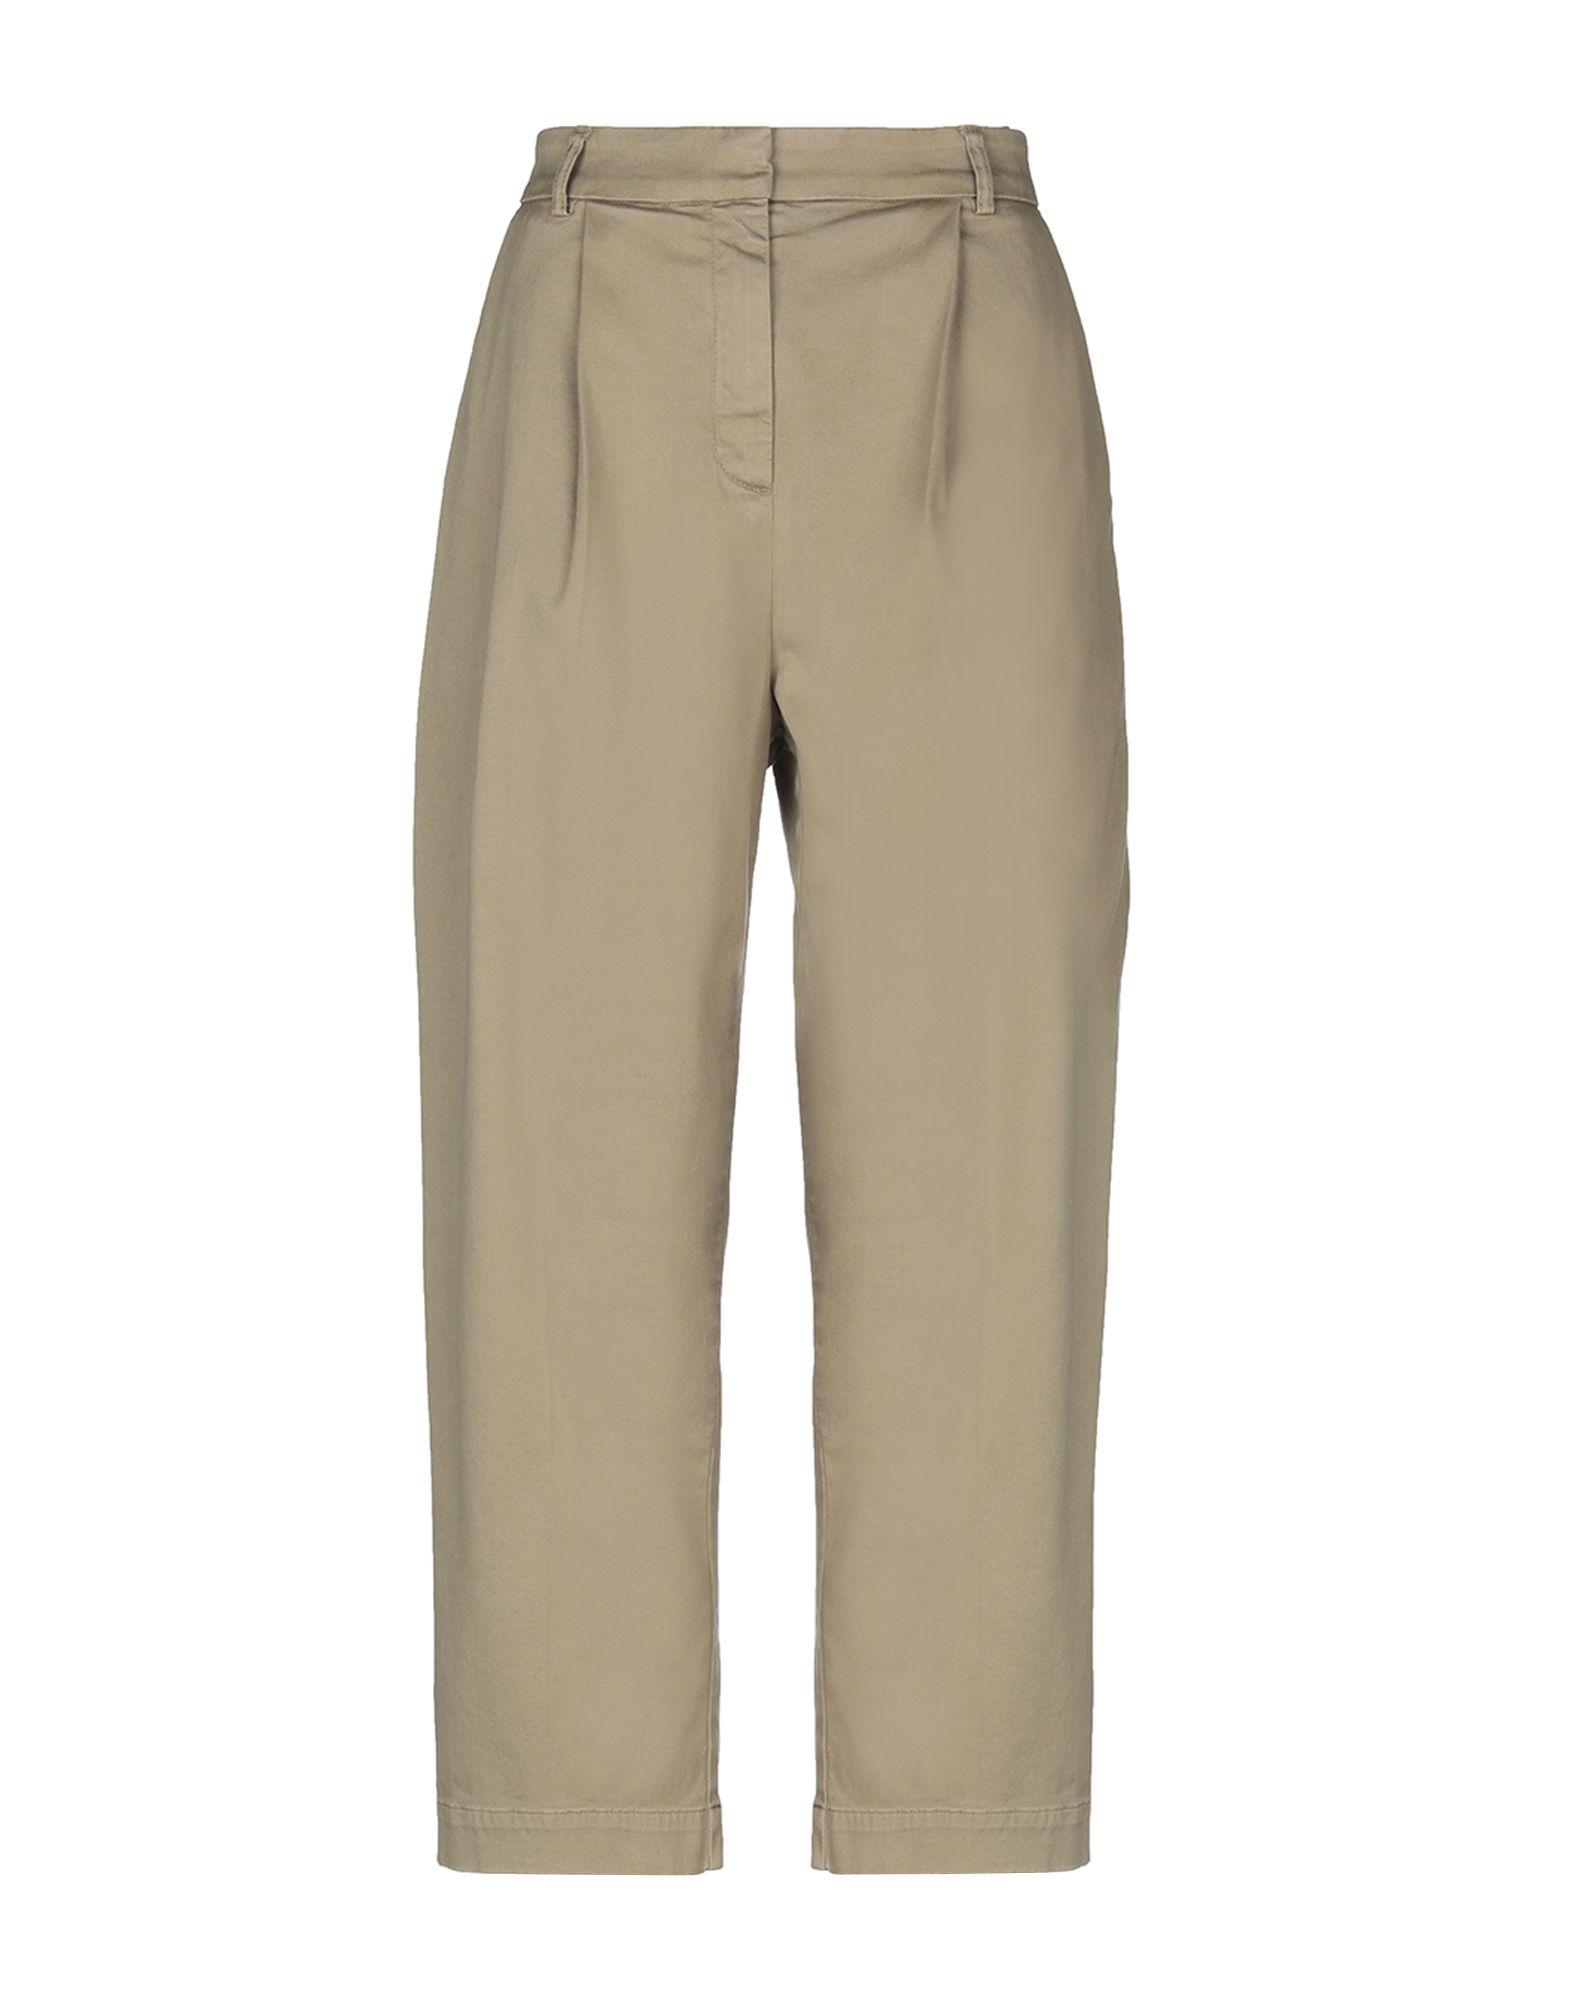 YMC YOU MUST CREATE Повседневные брюки цена и фото